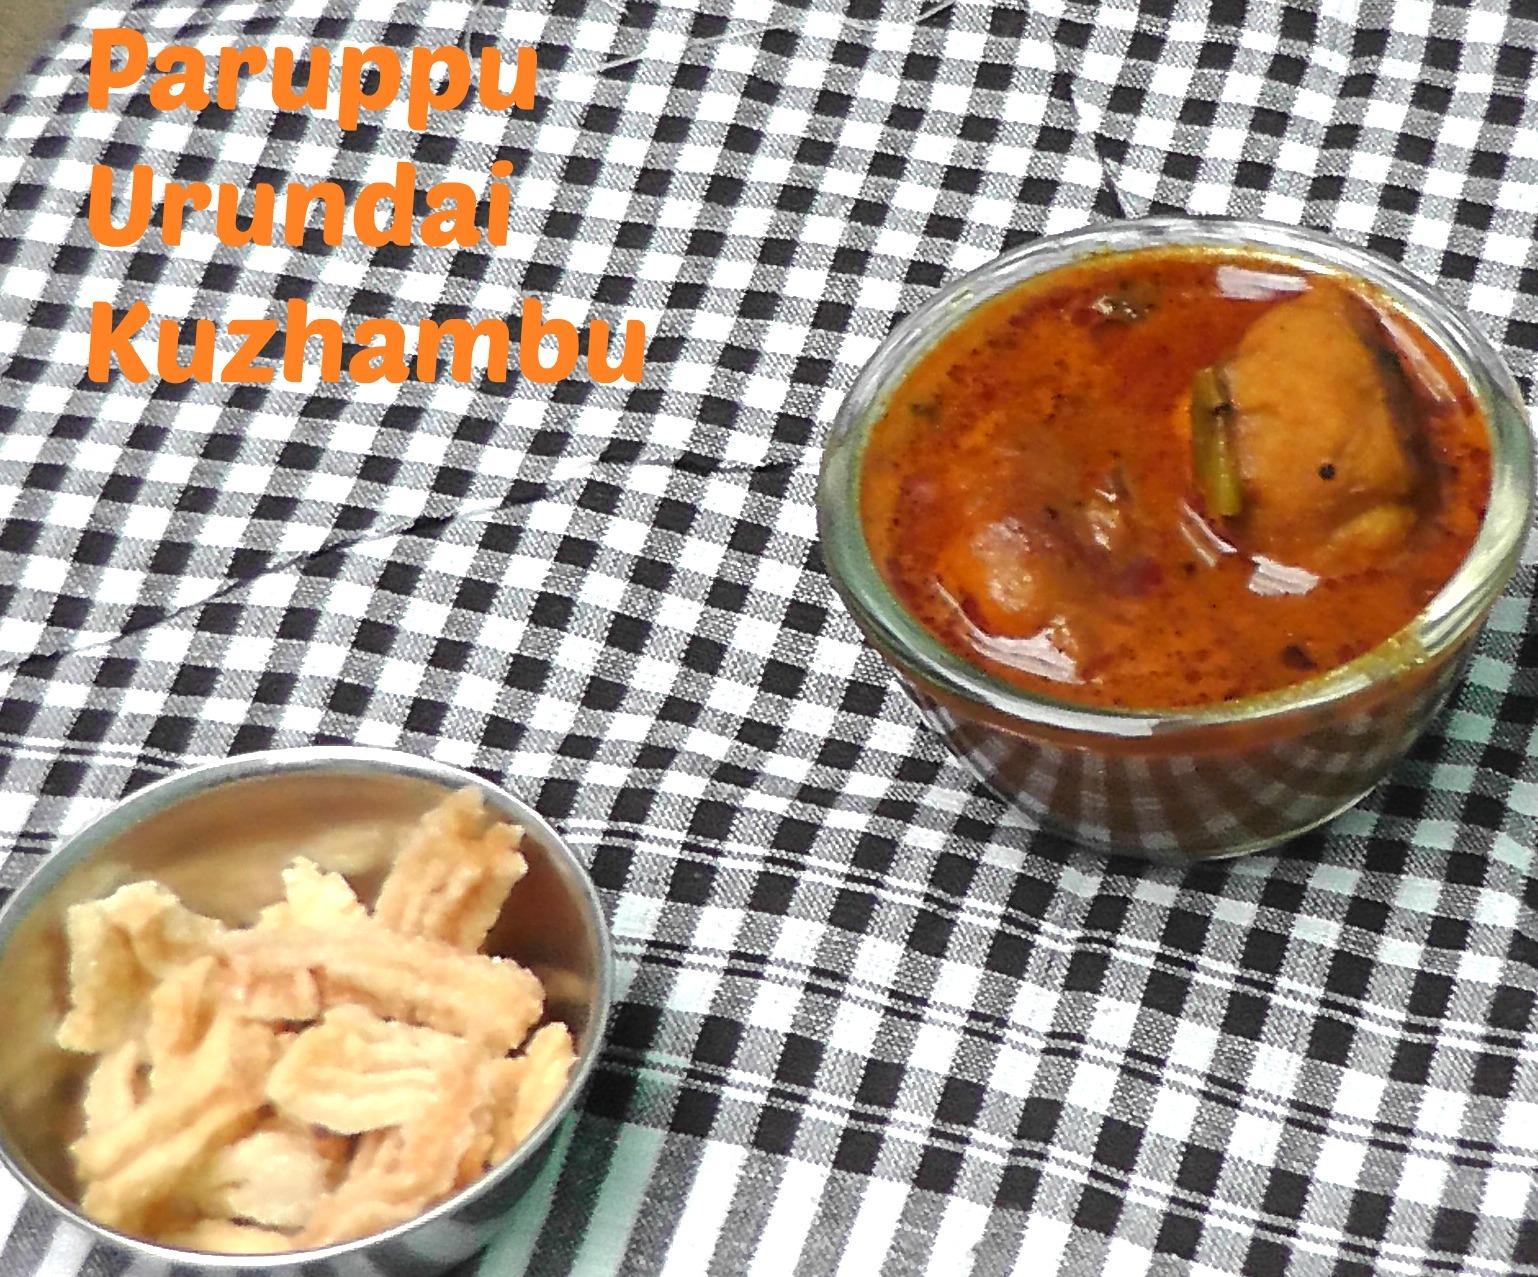 Paruppu Urundai Kuzhambu | Steamed Lentil Balls In A Tangy Sauce